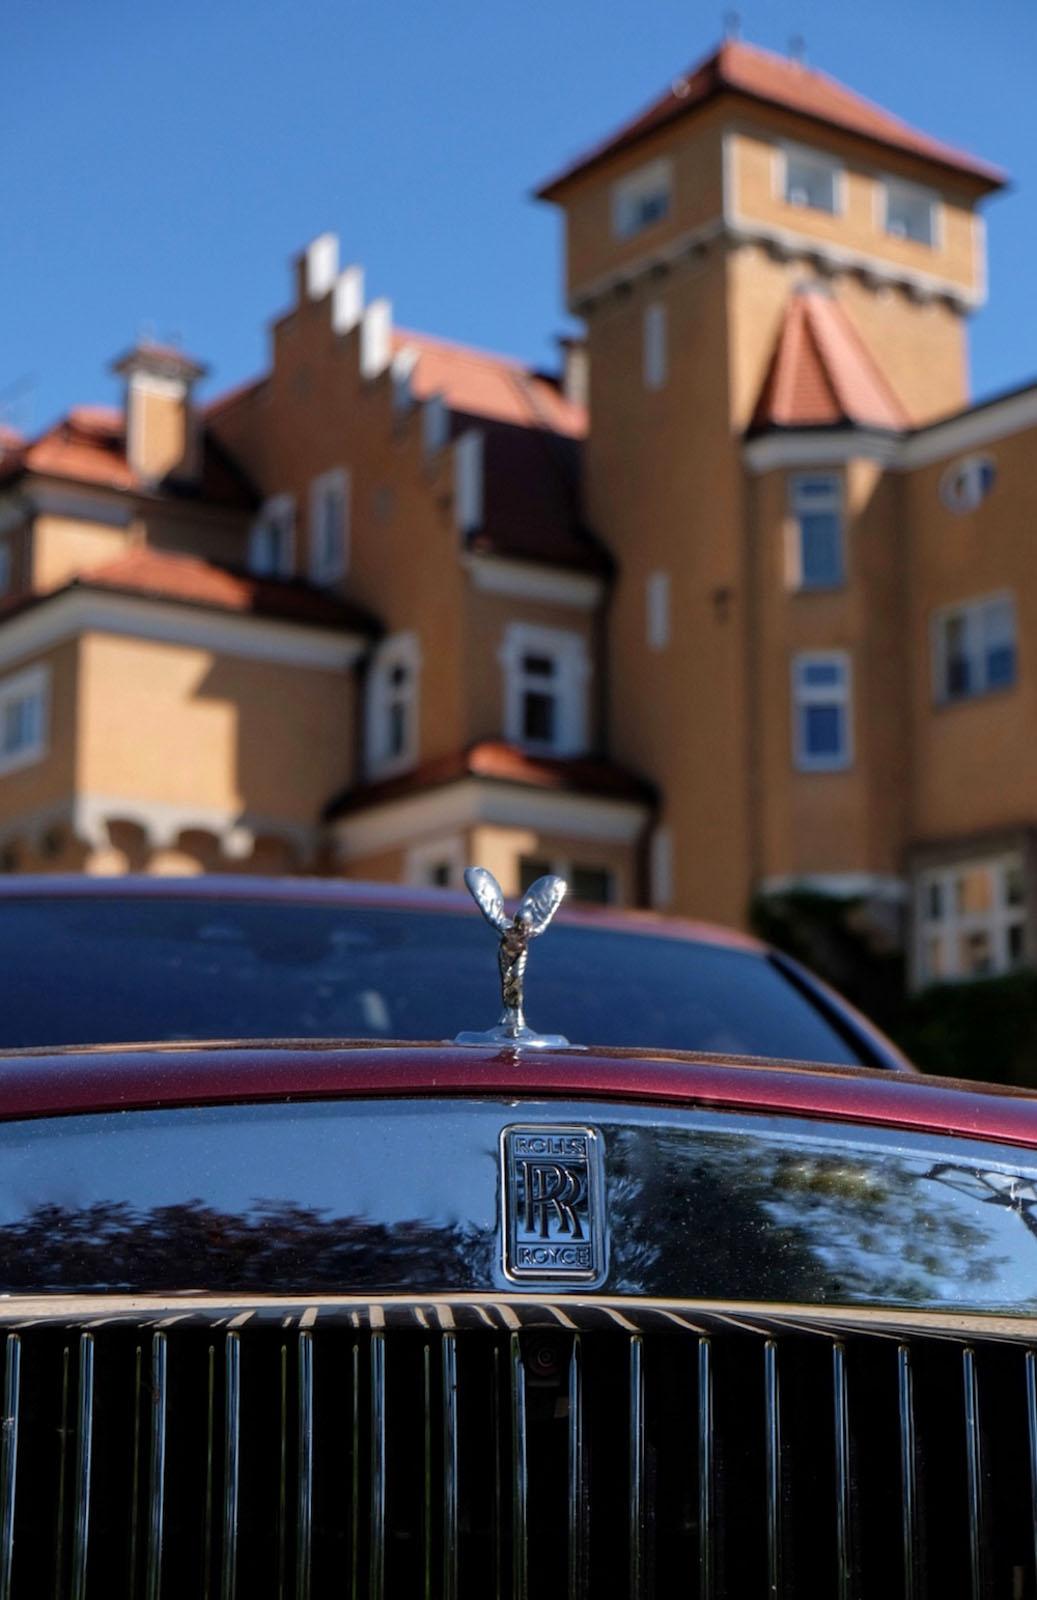 Rolls_Royce Schloss Moenchstein